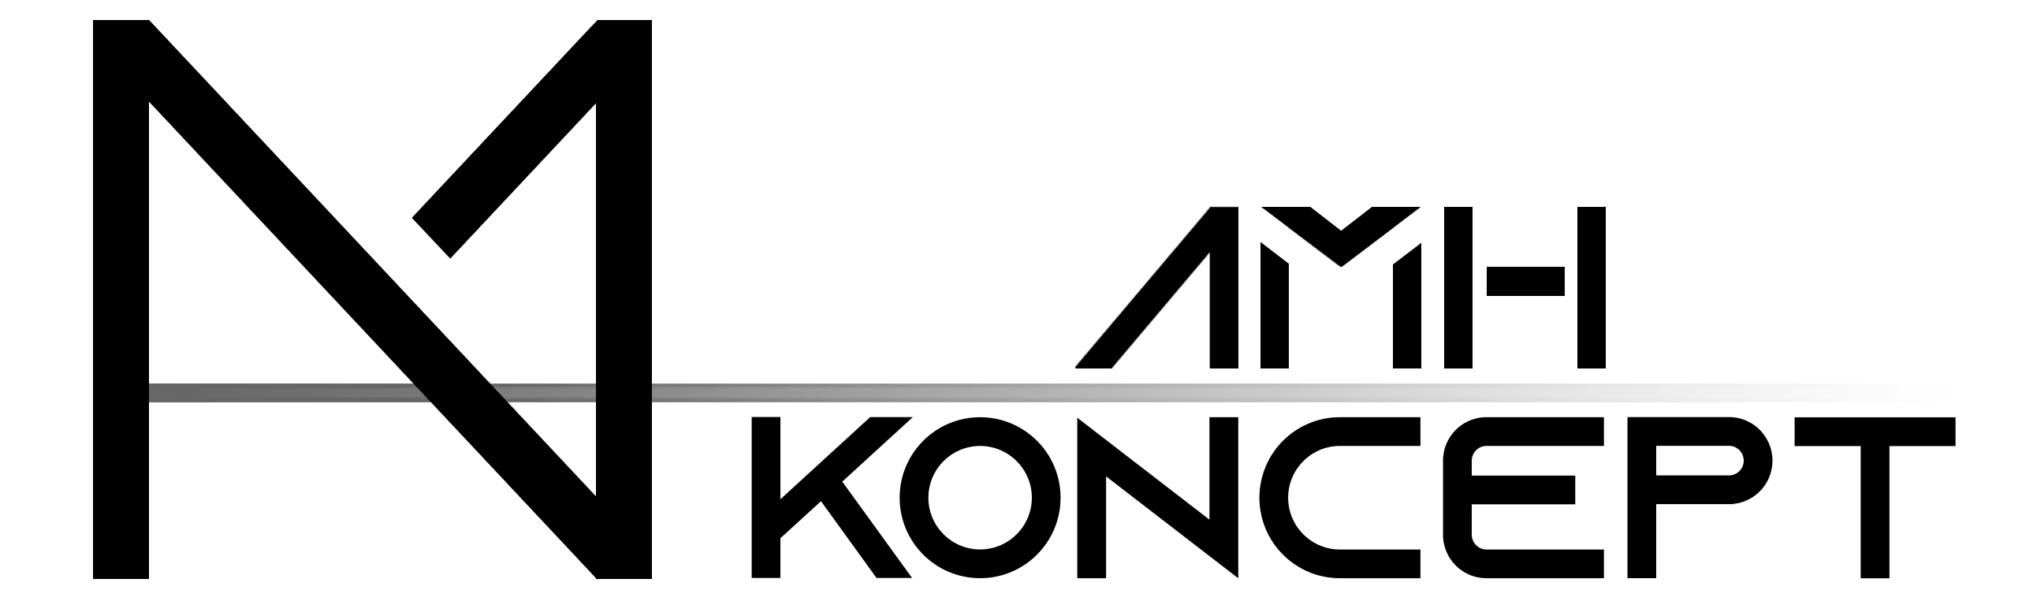 AMH-KONCEPT